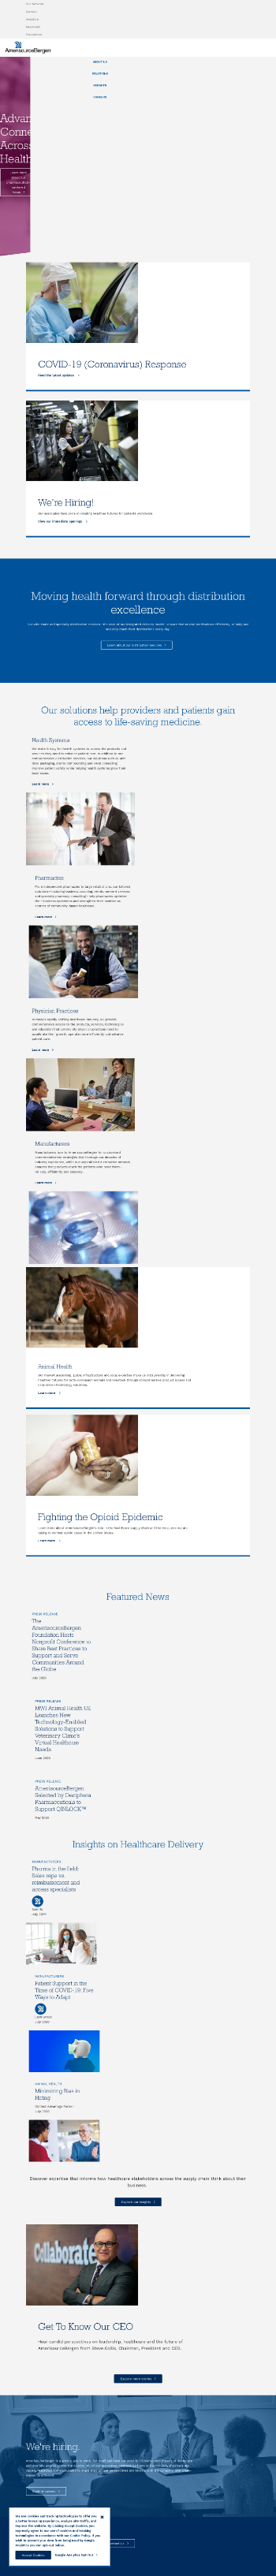 AmerisourceBergen Corporation Website Screenshot